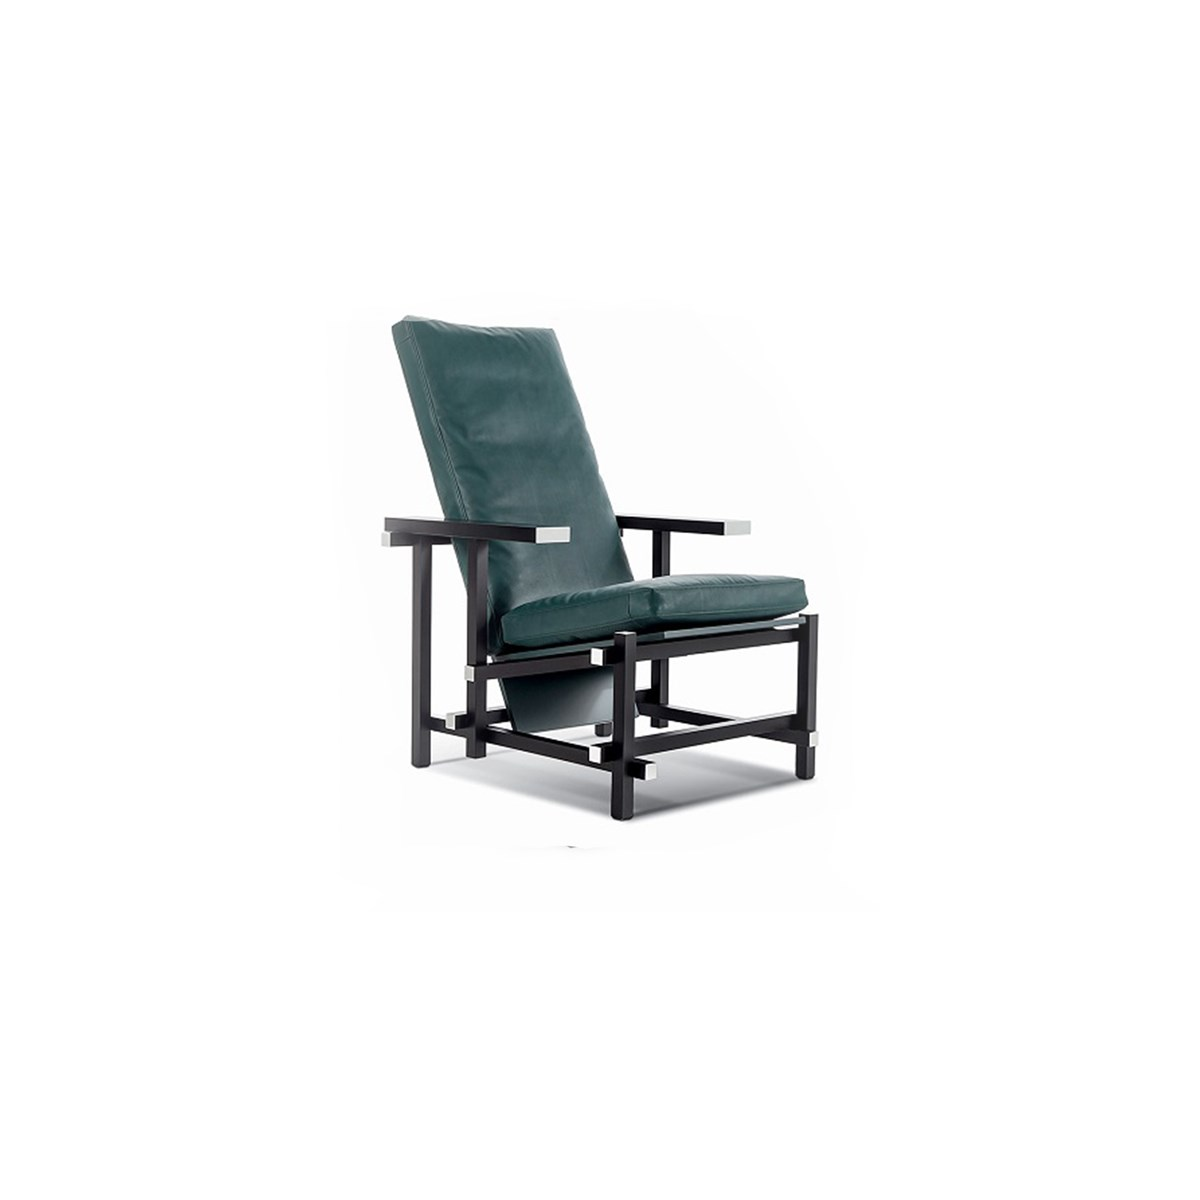 Cassina-Gerrit-Thomas-Rietveld-Black-Red-Blue-Armchair-Matisse-1